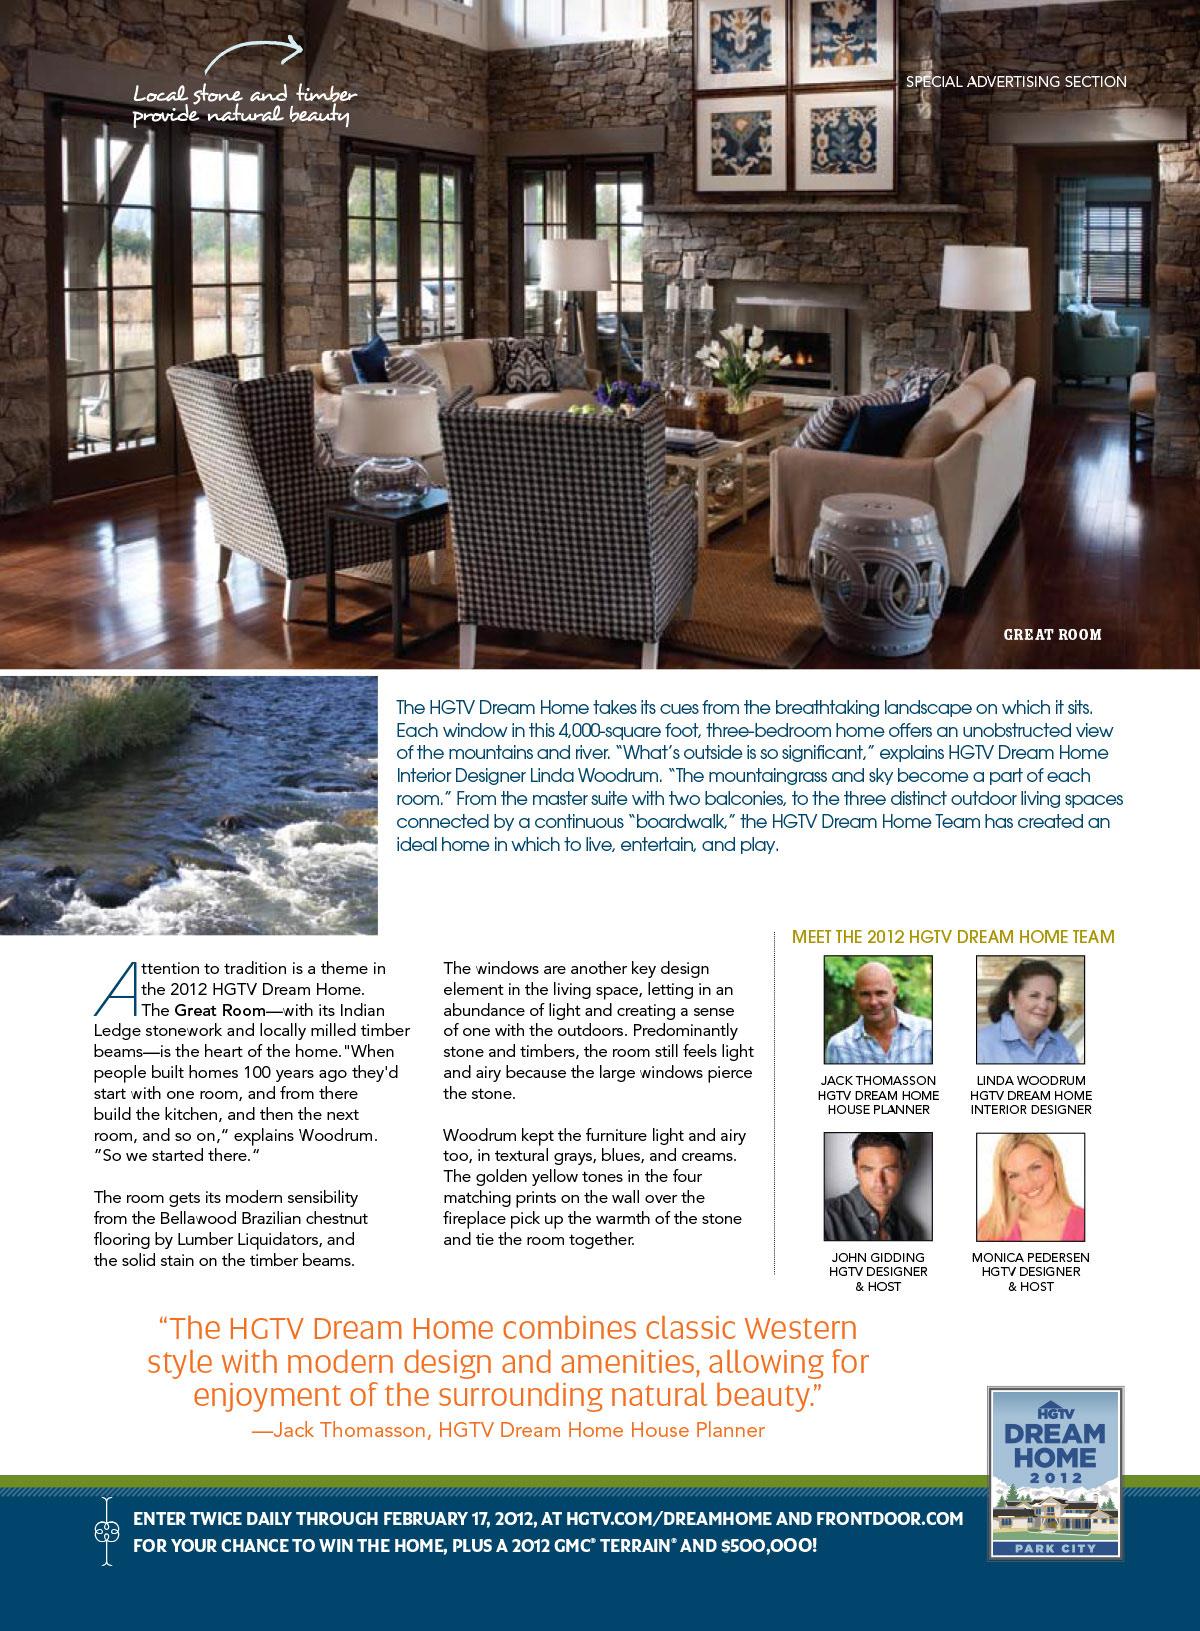 Lisa Minardi - HGTV Dream Home 2012